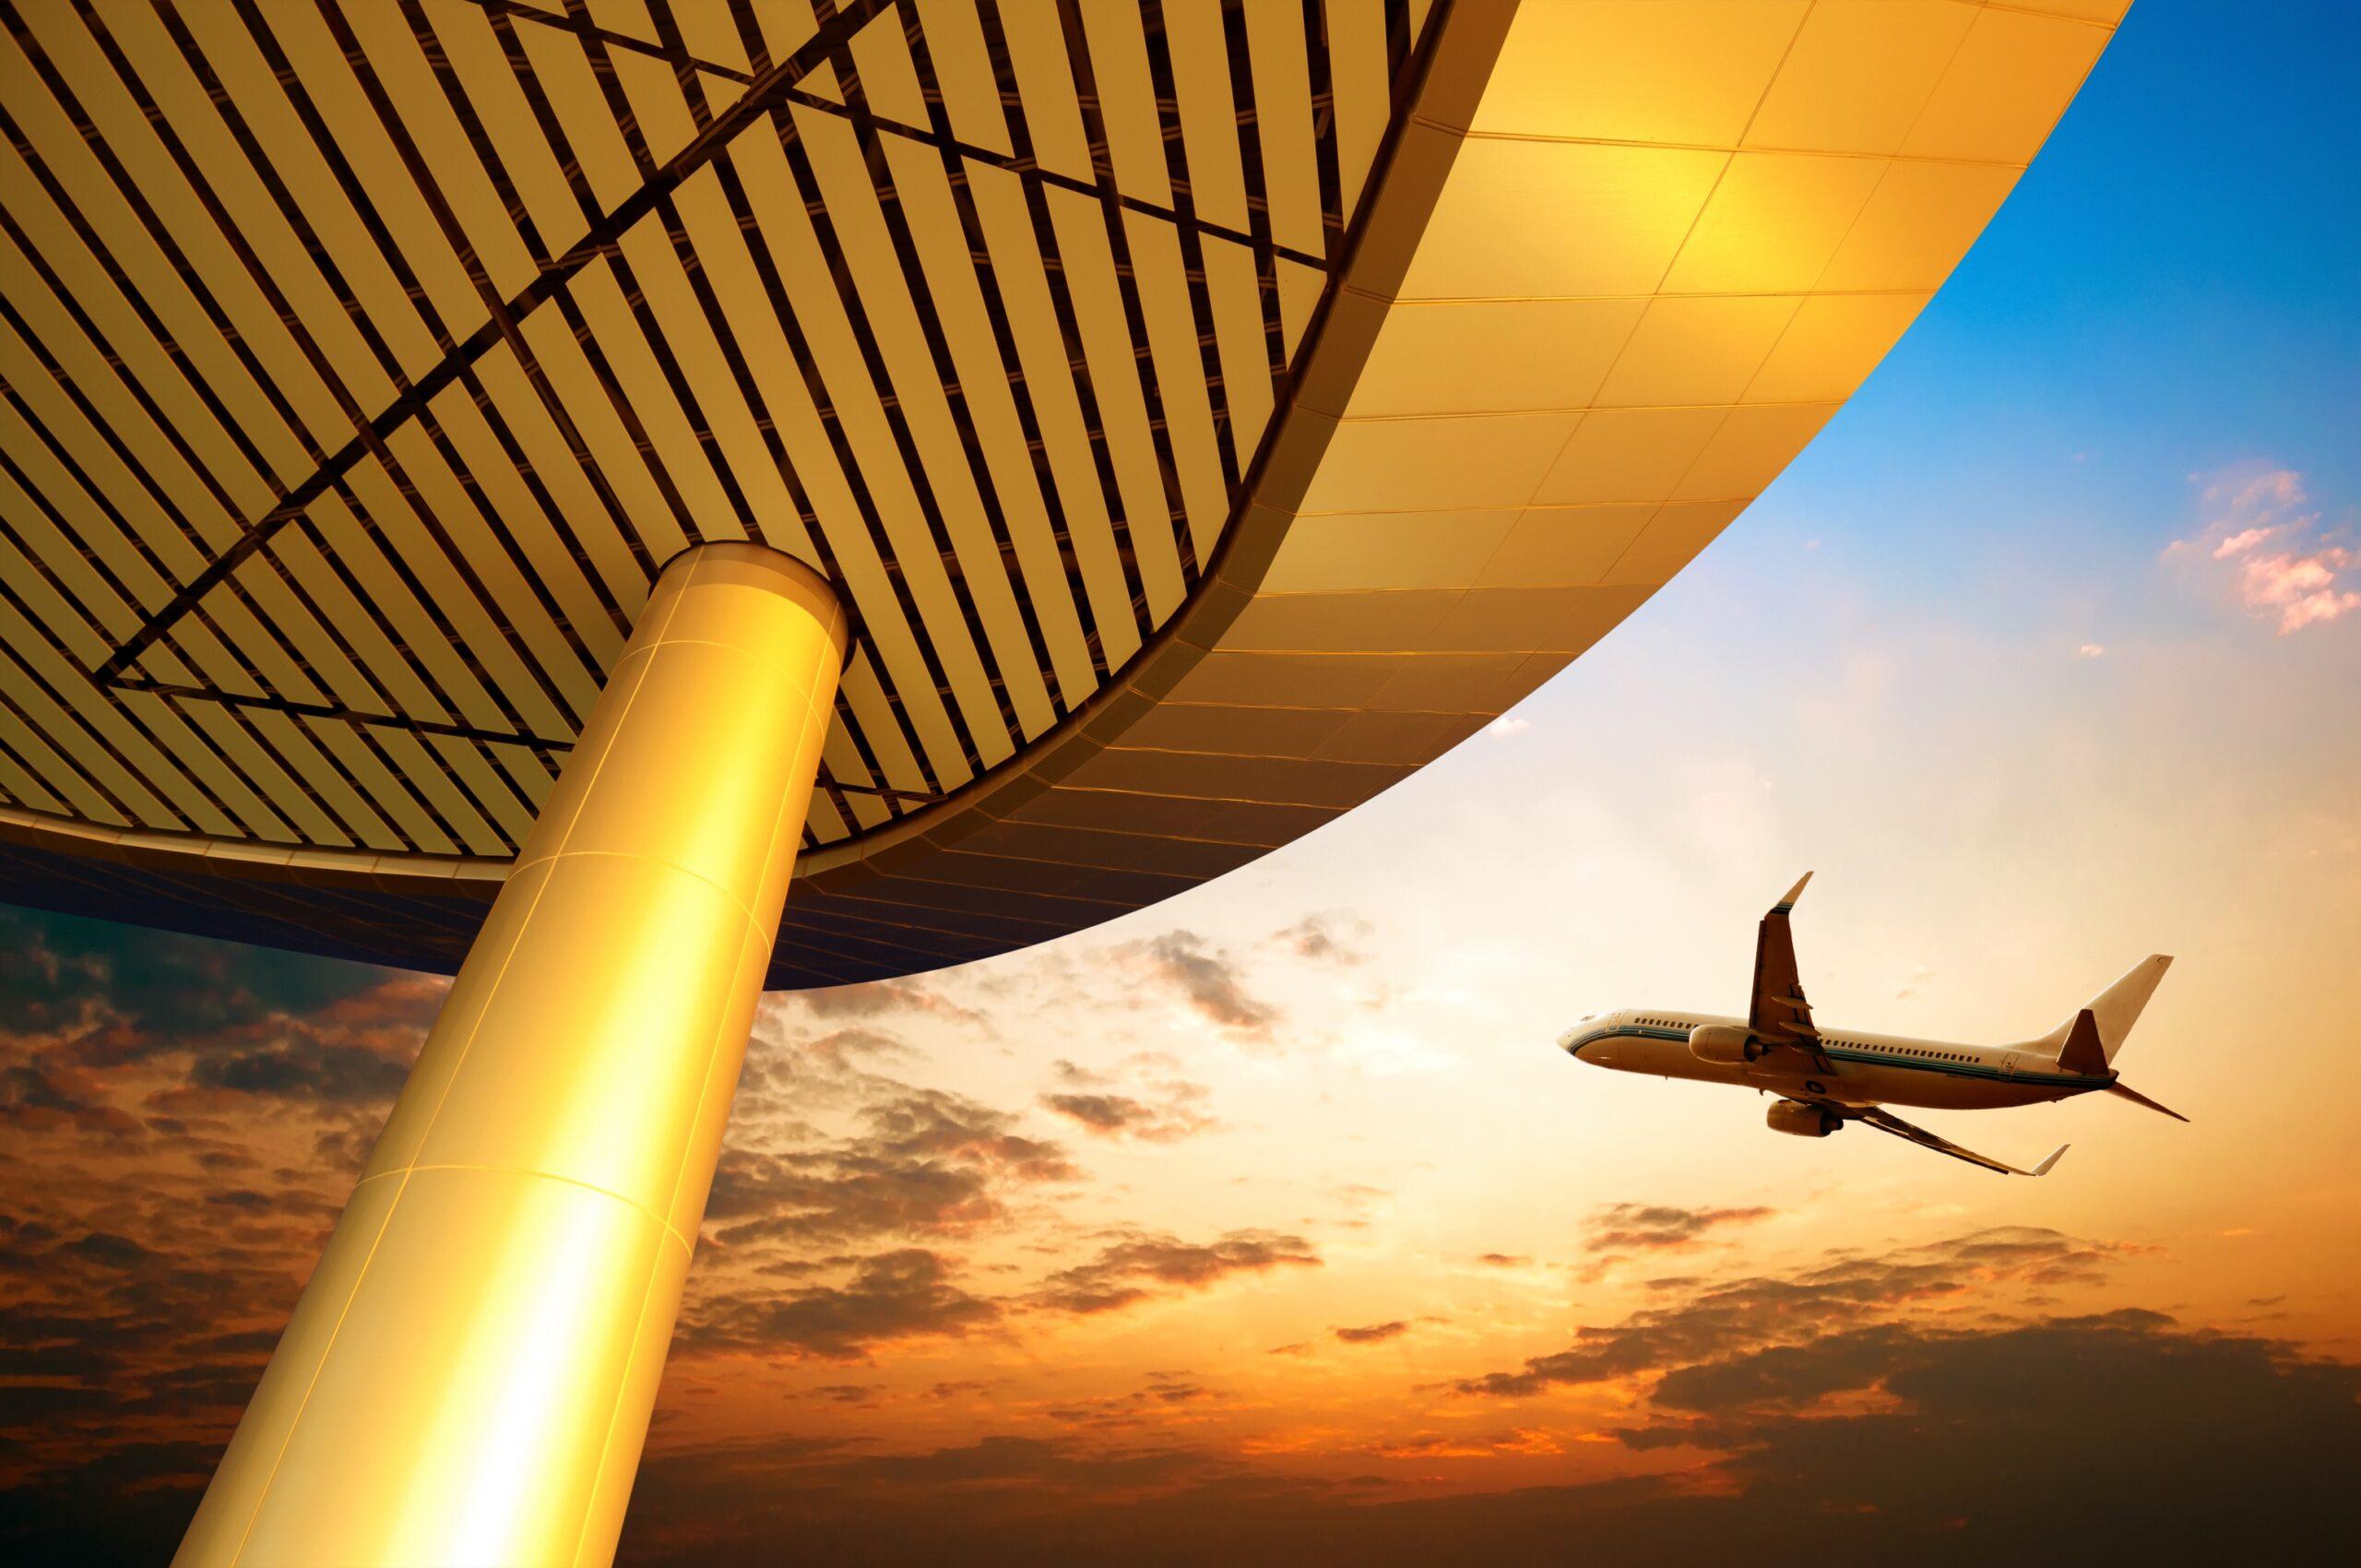 Aeroporto Internacional de Xangai Pudong